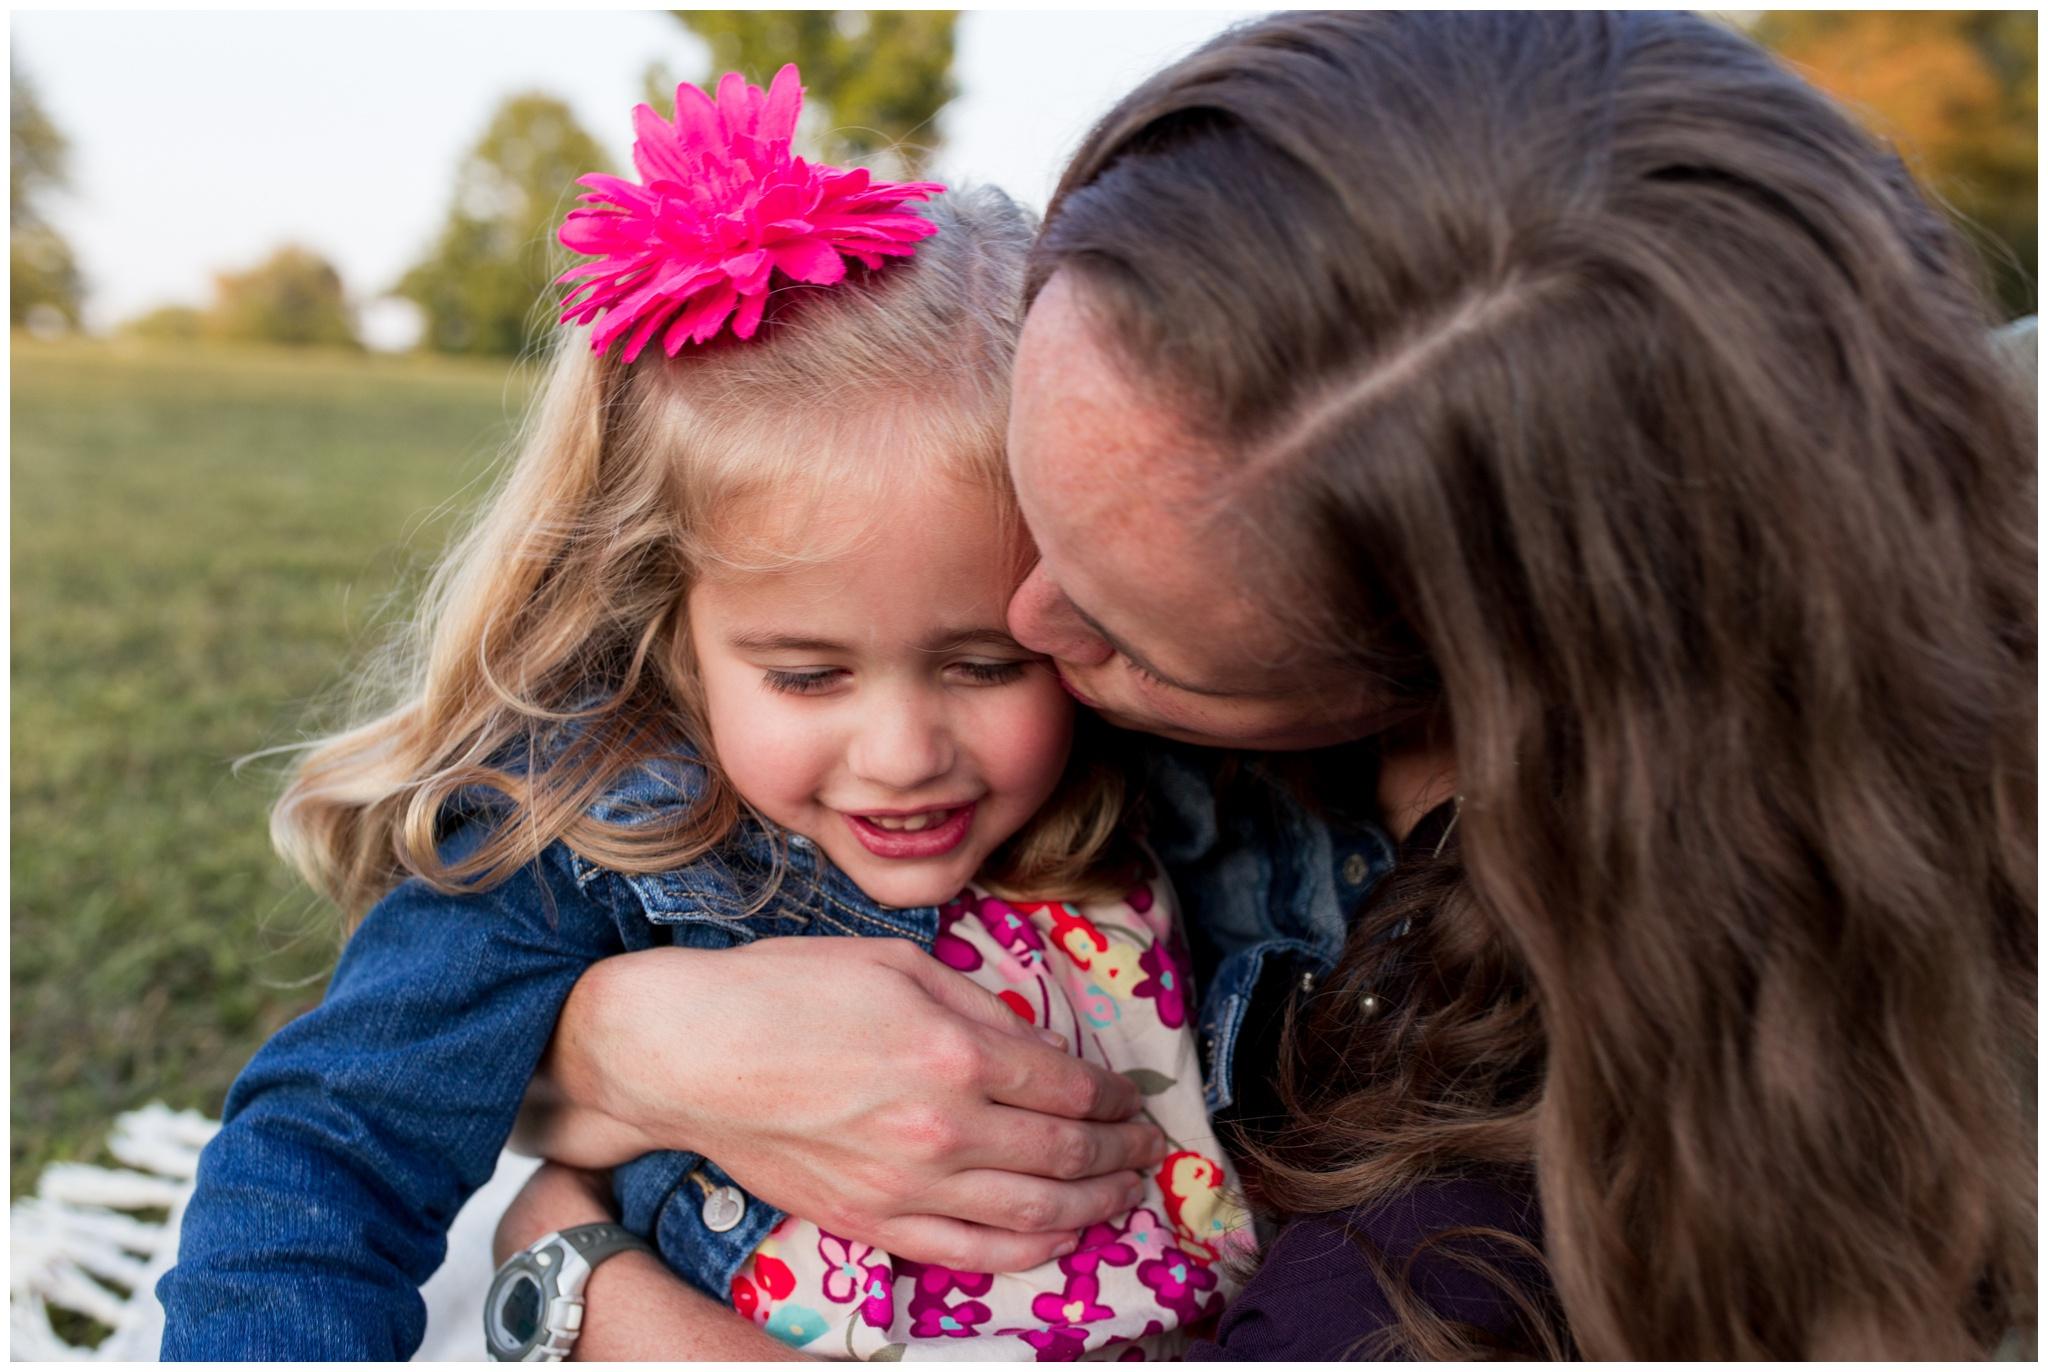 mom kissing cheek of daughter during family portraits at Wildcat Creek Reservoir Park in Kokomo Indiana